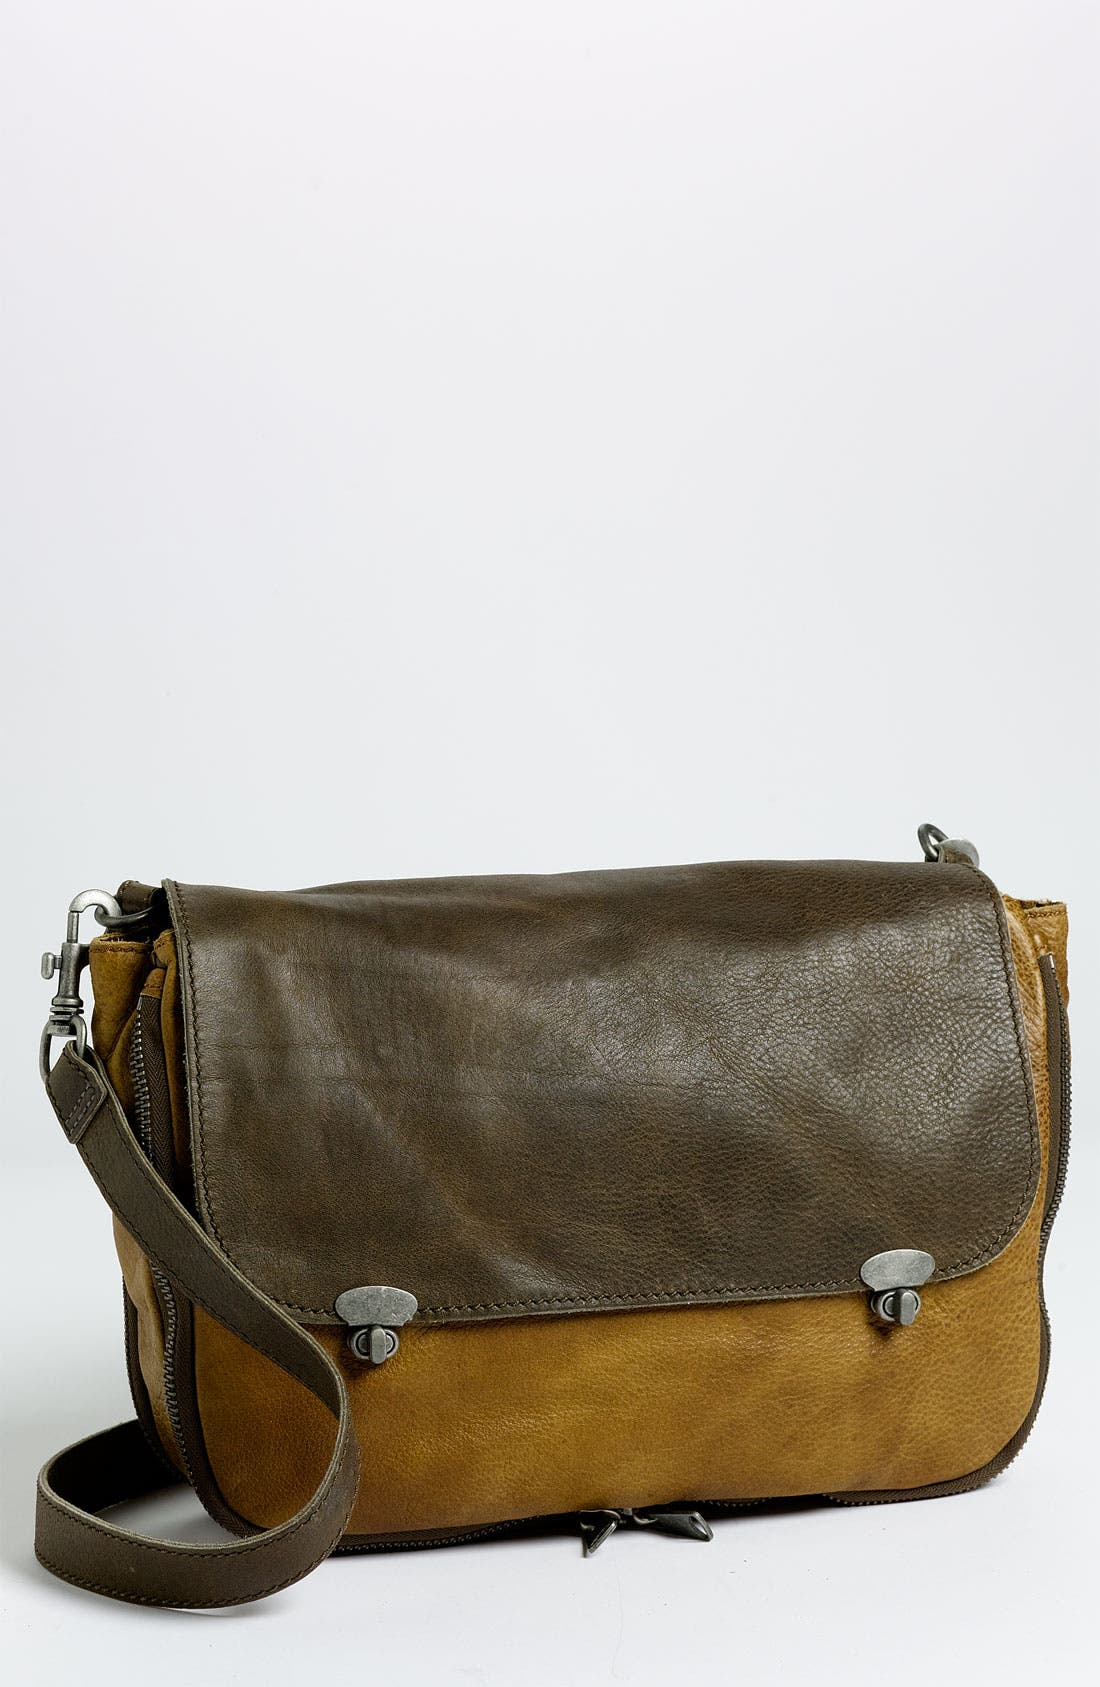 Alternate Image 1 Selected - Liebeskind 'Olivia' Crossbody Bag